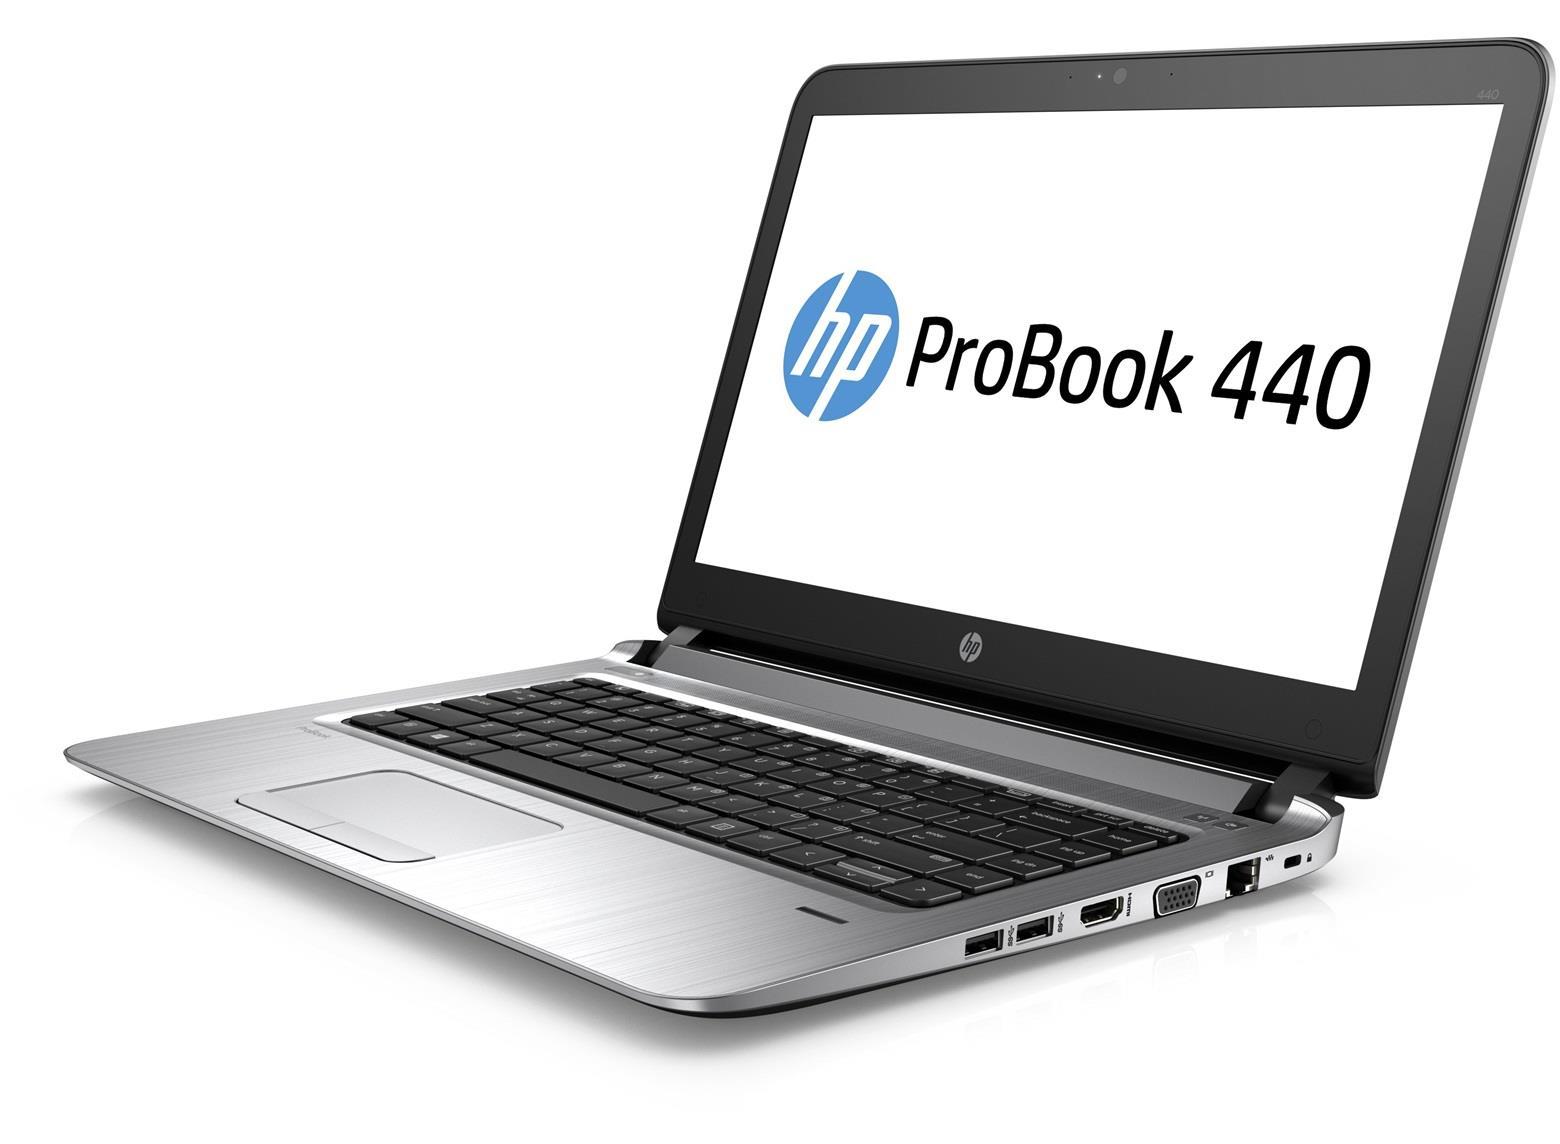 HP PROBOOK 440 G3 REALTEK CARD READER WINDOWS 8 X64 DRIVER